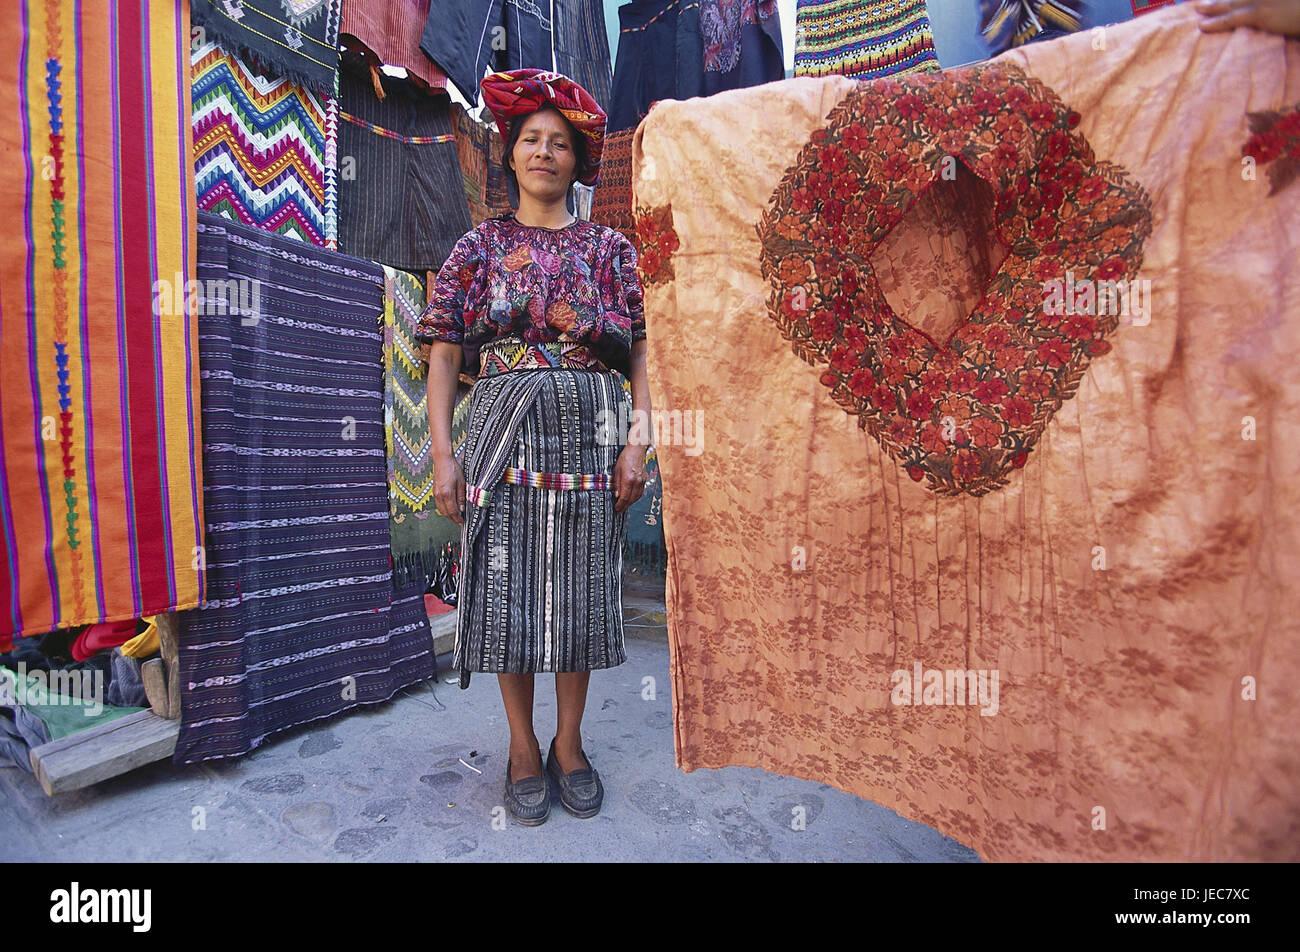 Religious Syncretism Chichicastenango Market Guatemala Central America Stock Image